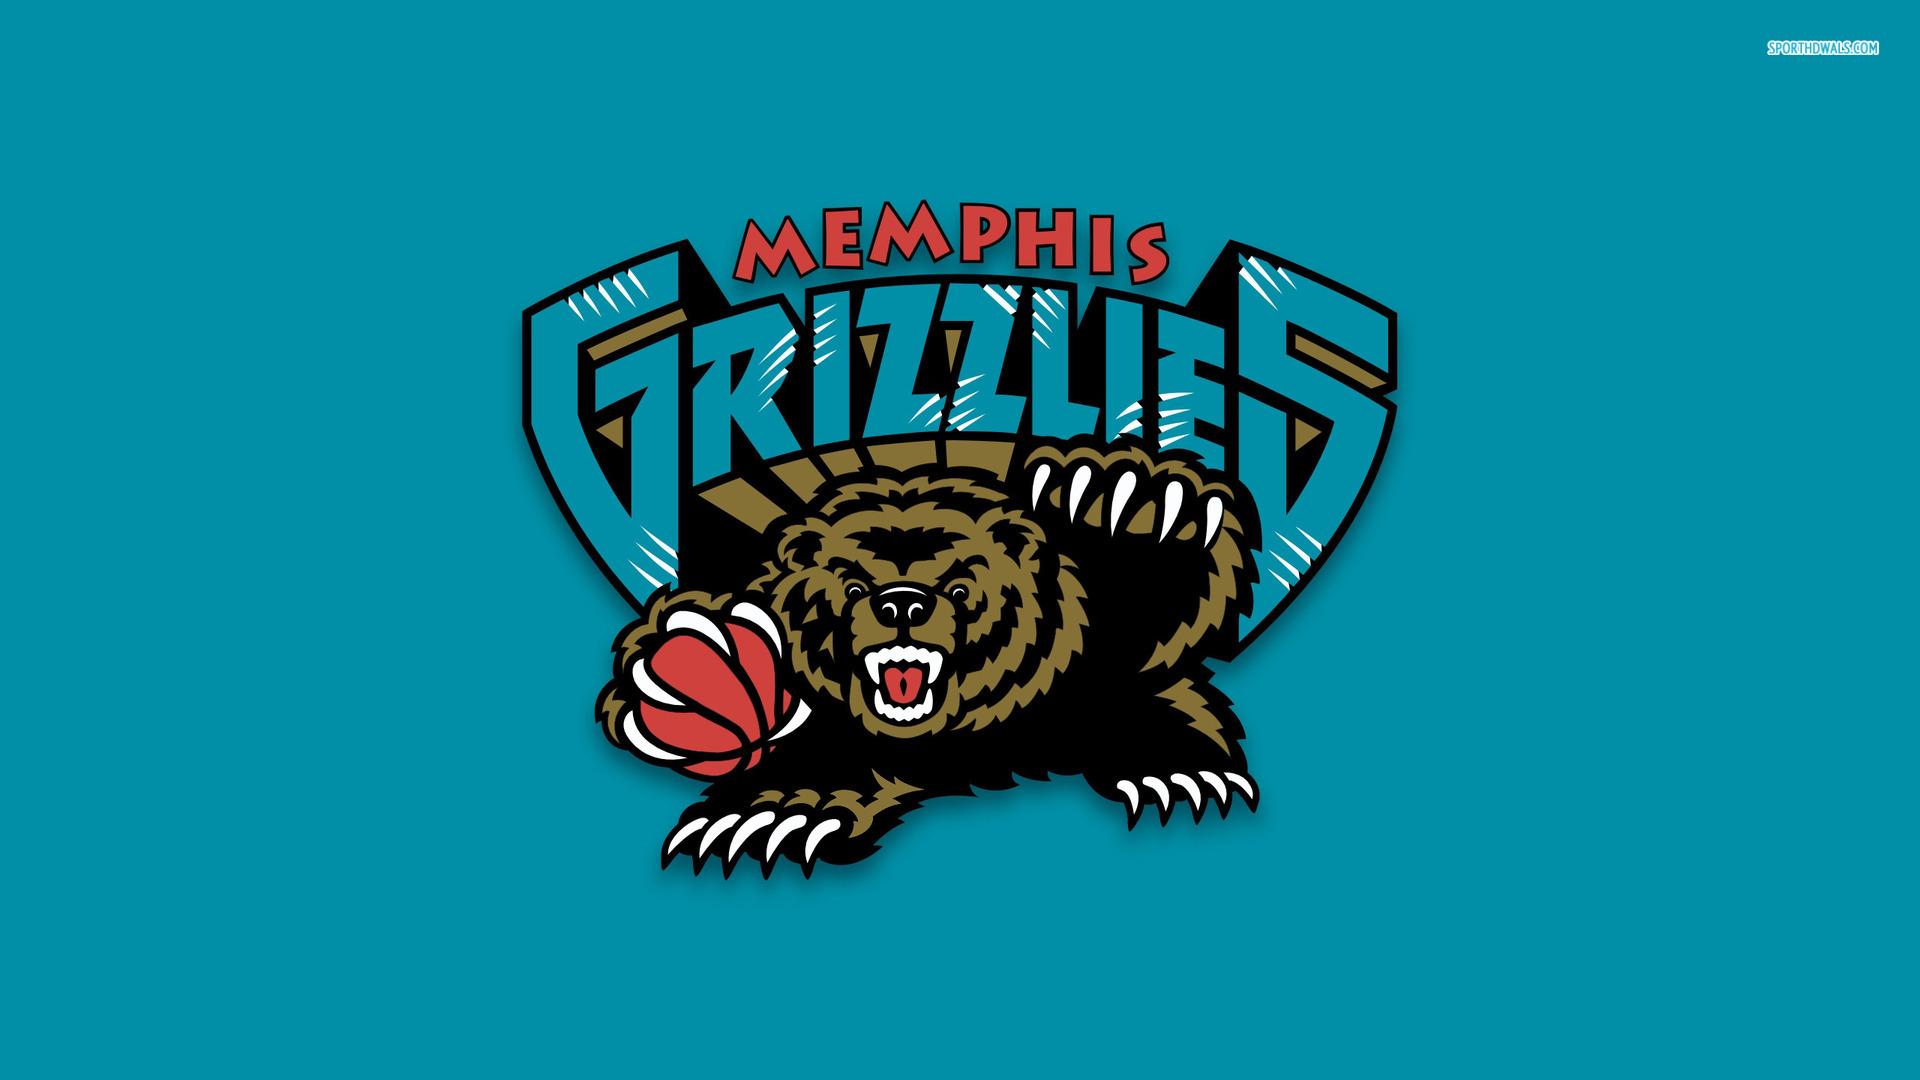 Memphis Grizzlies wallpapers hd